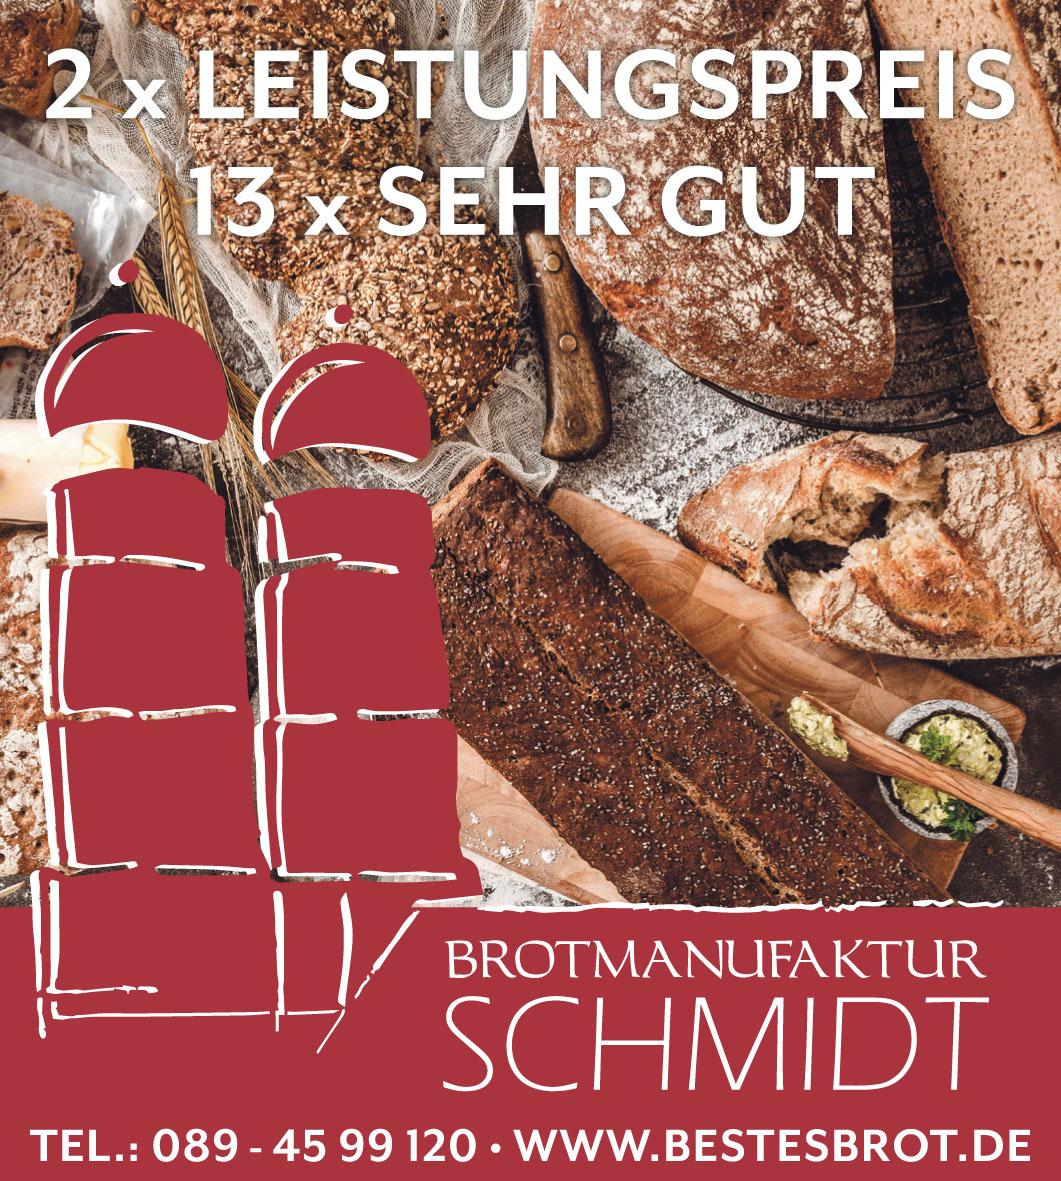 Brotmanufaktur Schmidt